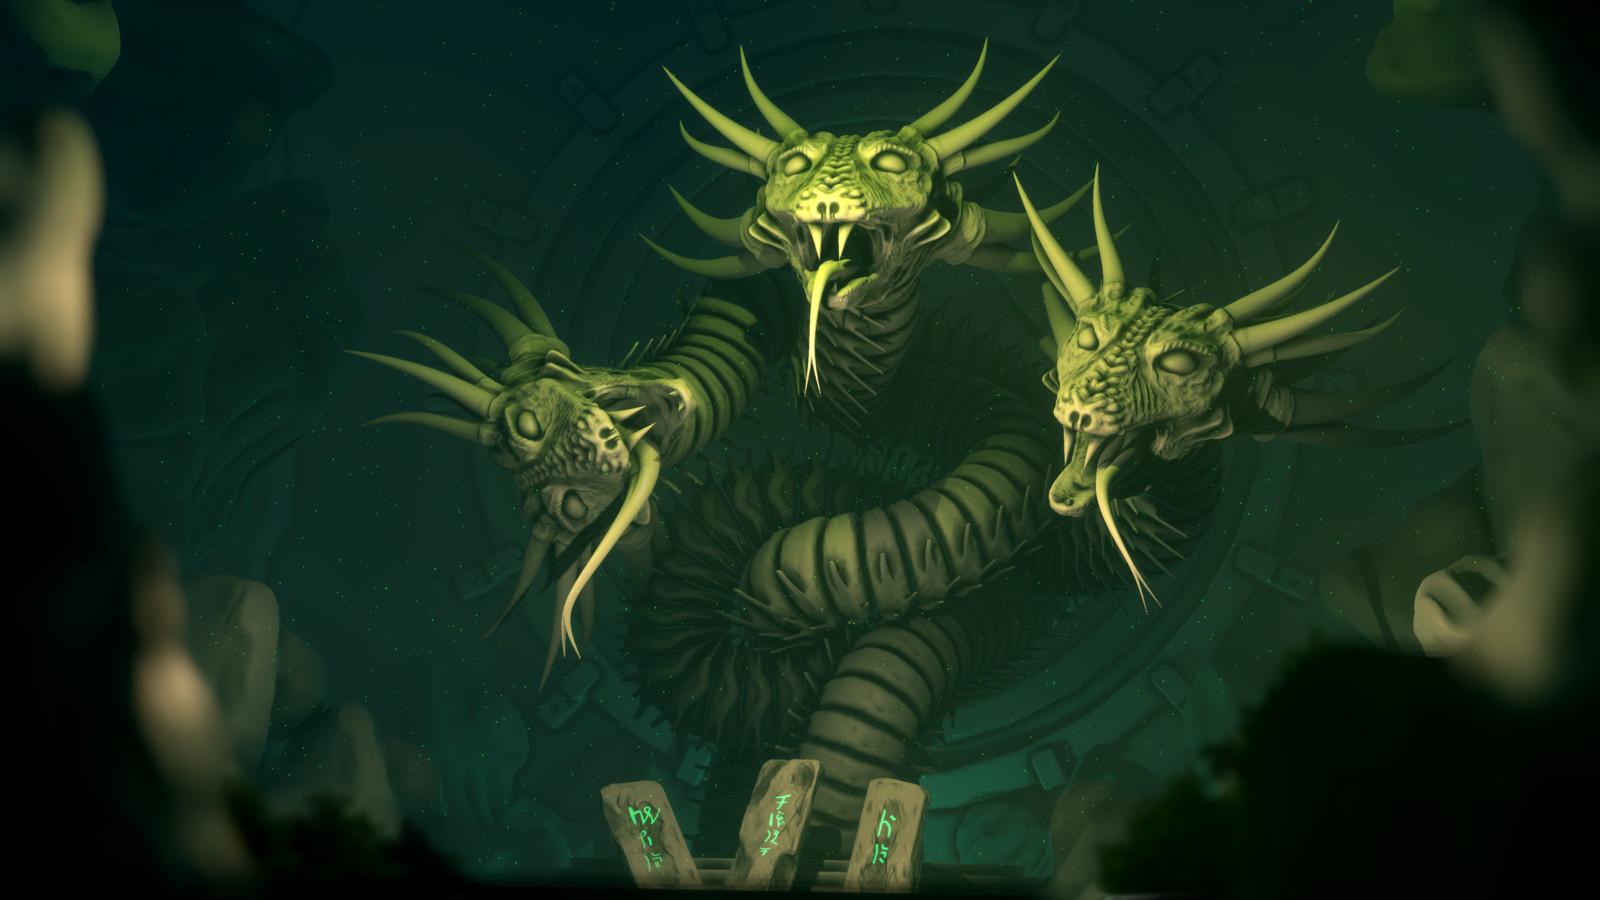 Hydra Sleeps Here